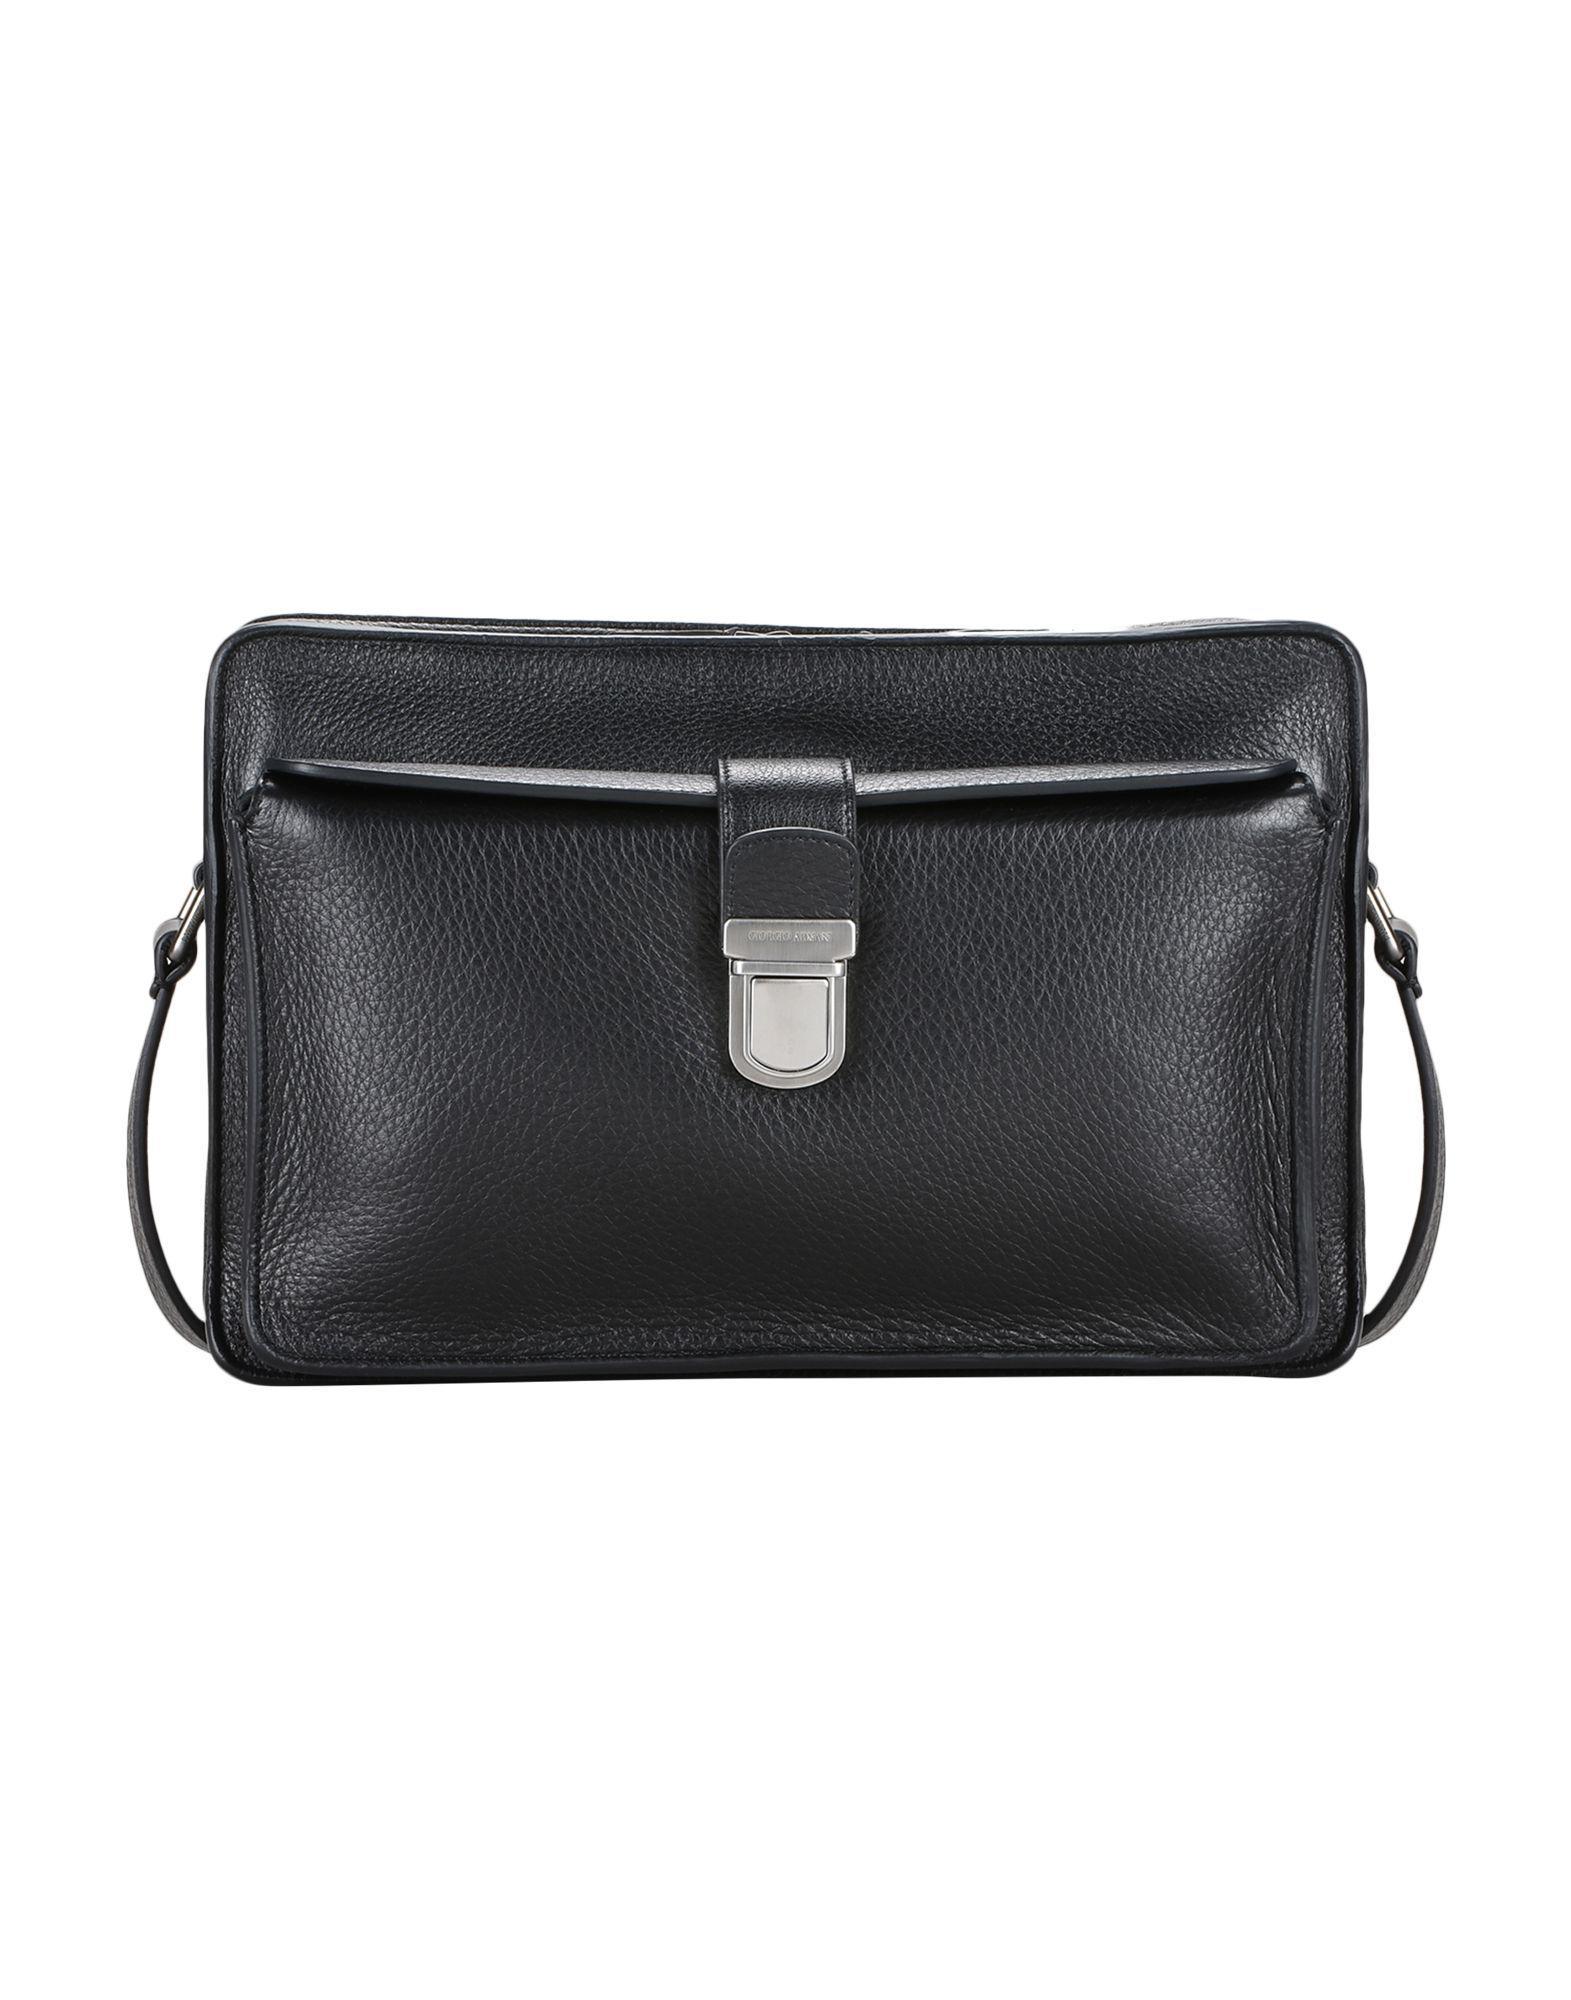 a63fc7861d18 Lyst - Giorgio Armani Cross-body Bags in Brown for Men